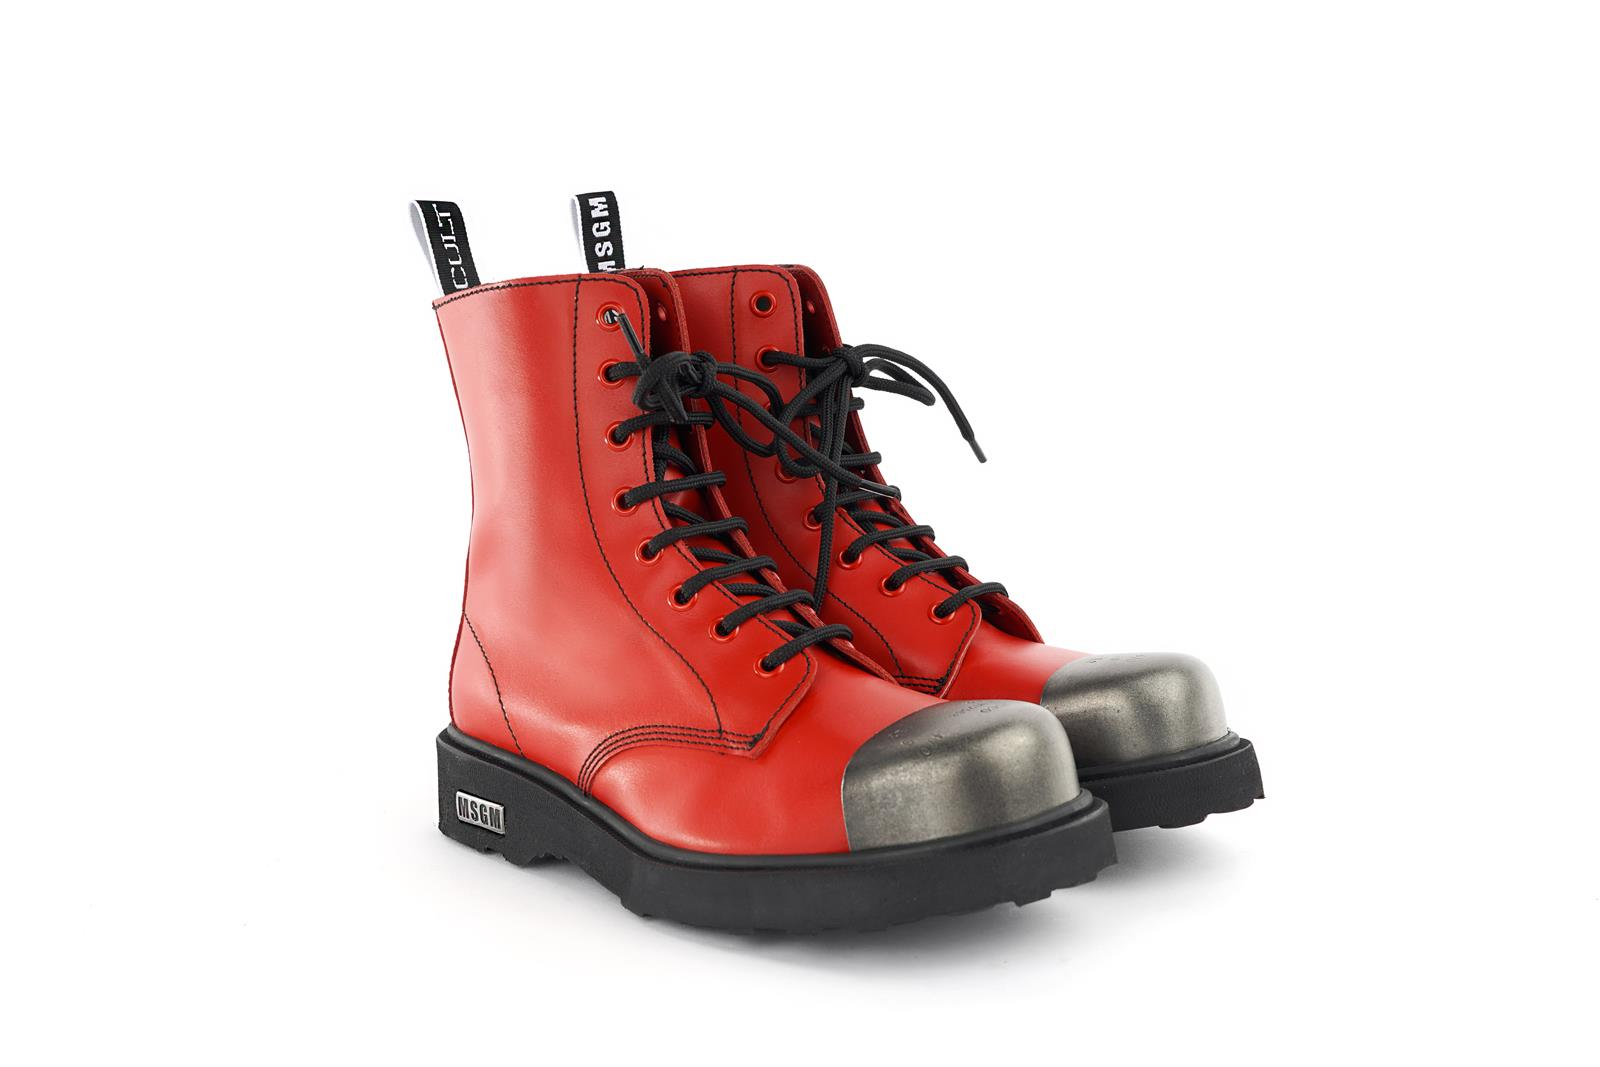 msgm x cult scarpe